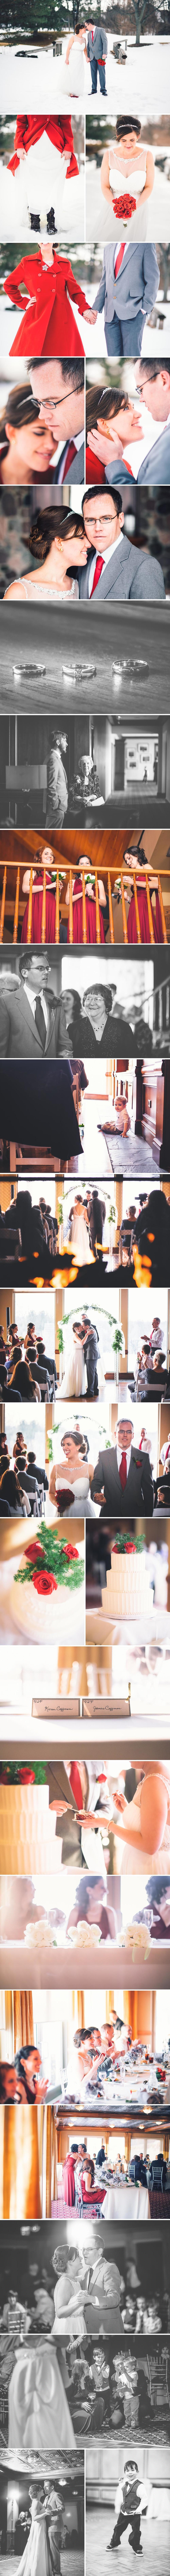 Chicago_Fine_Art_Wedding_Photography_coffman2.jpg